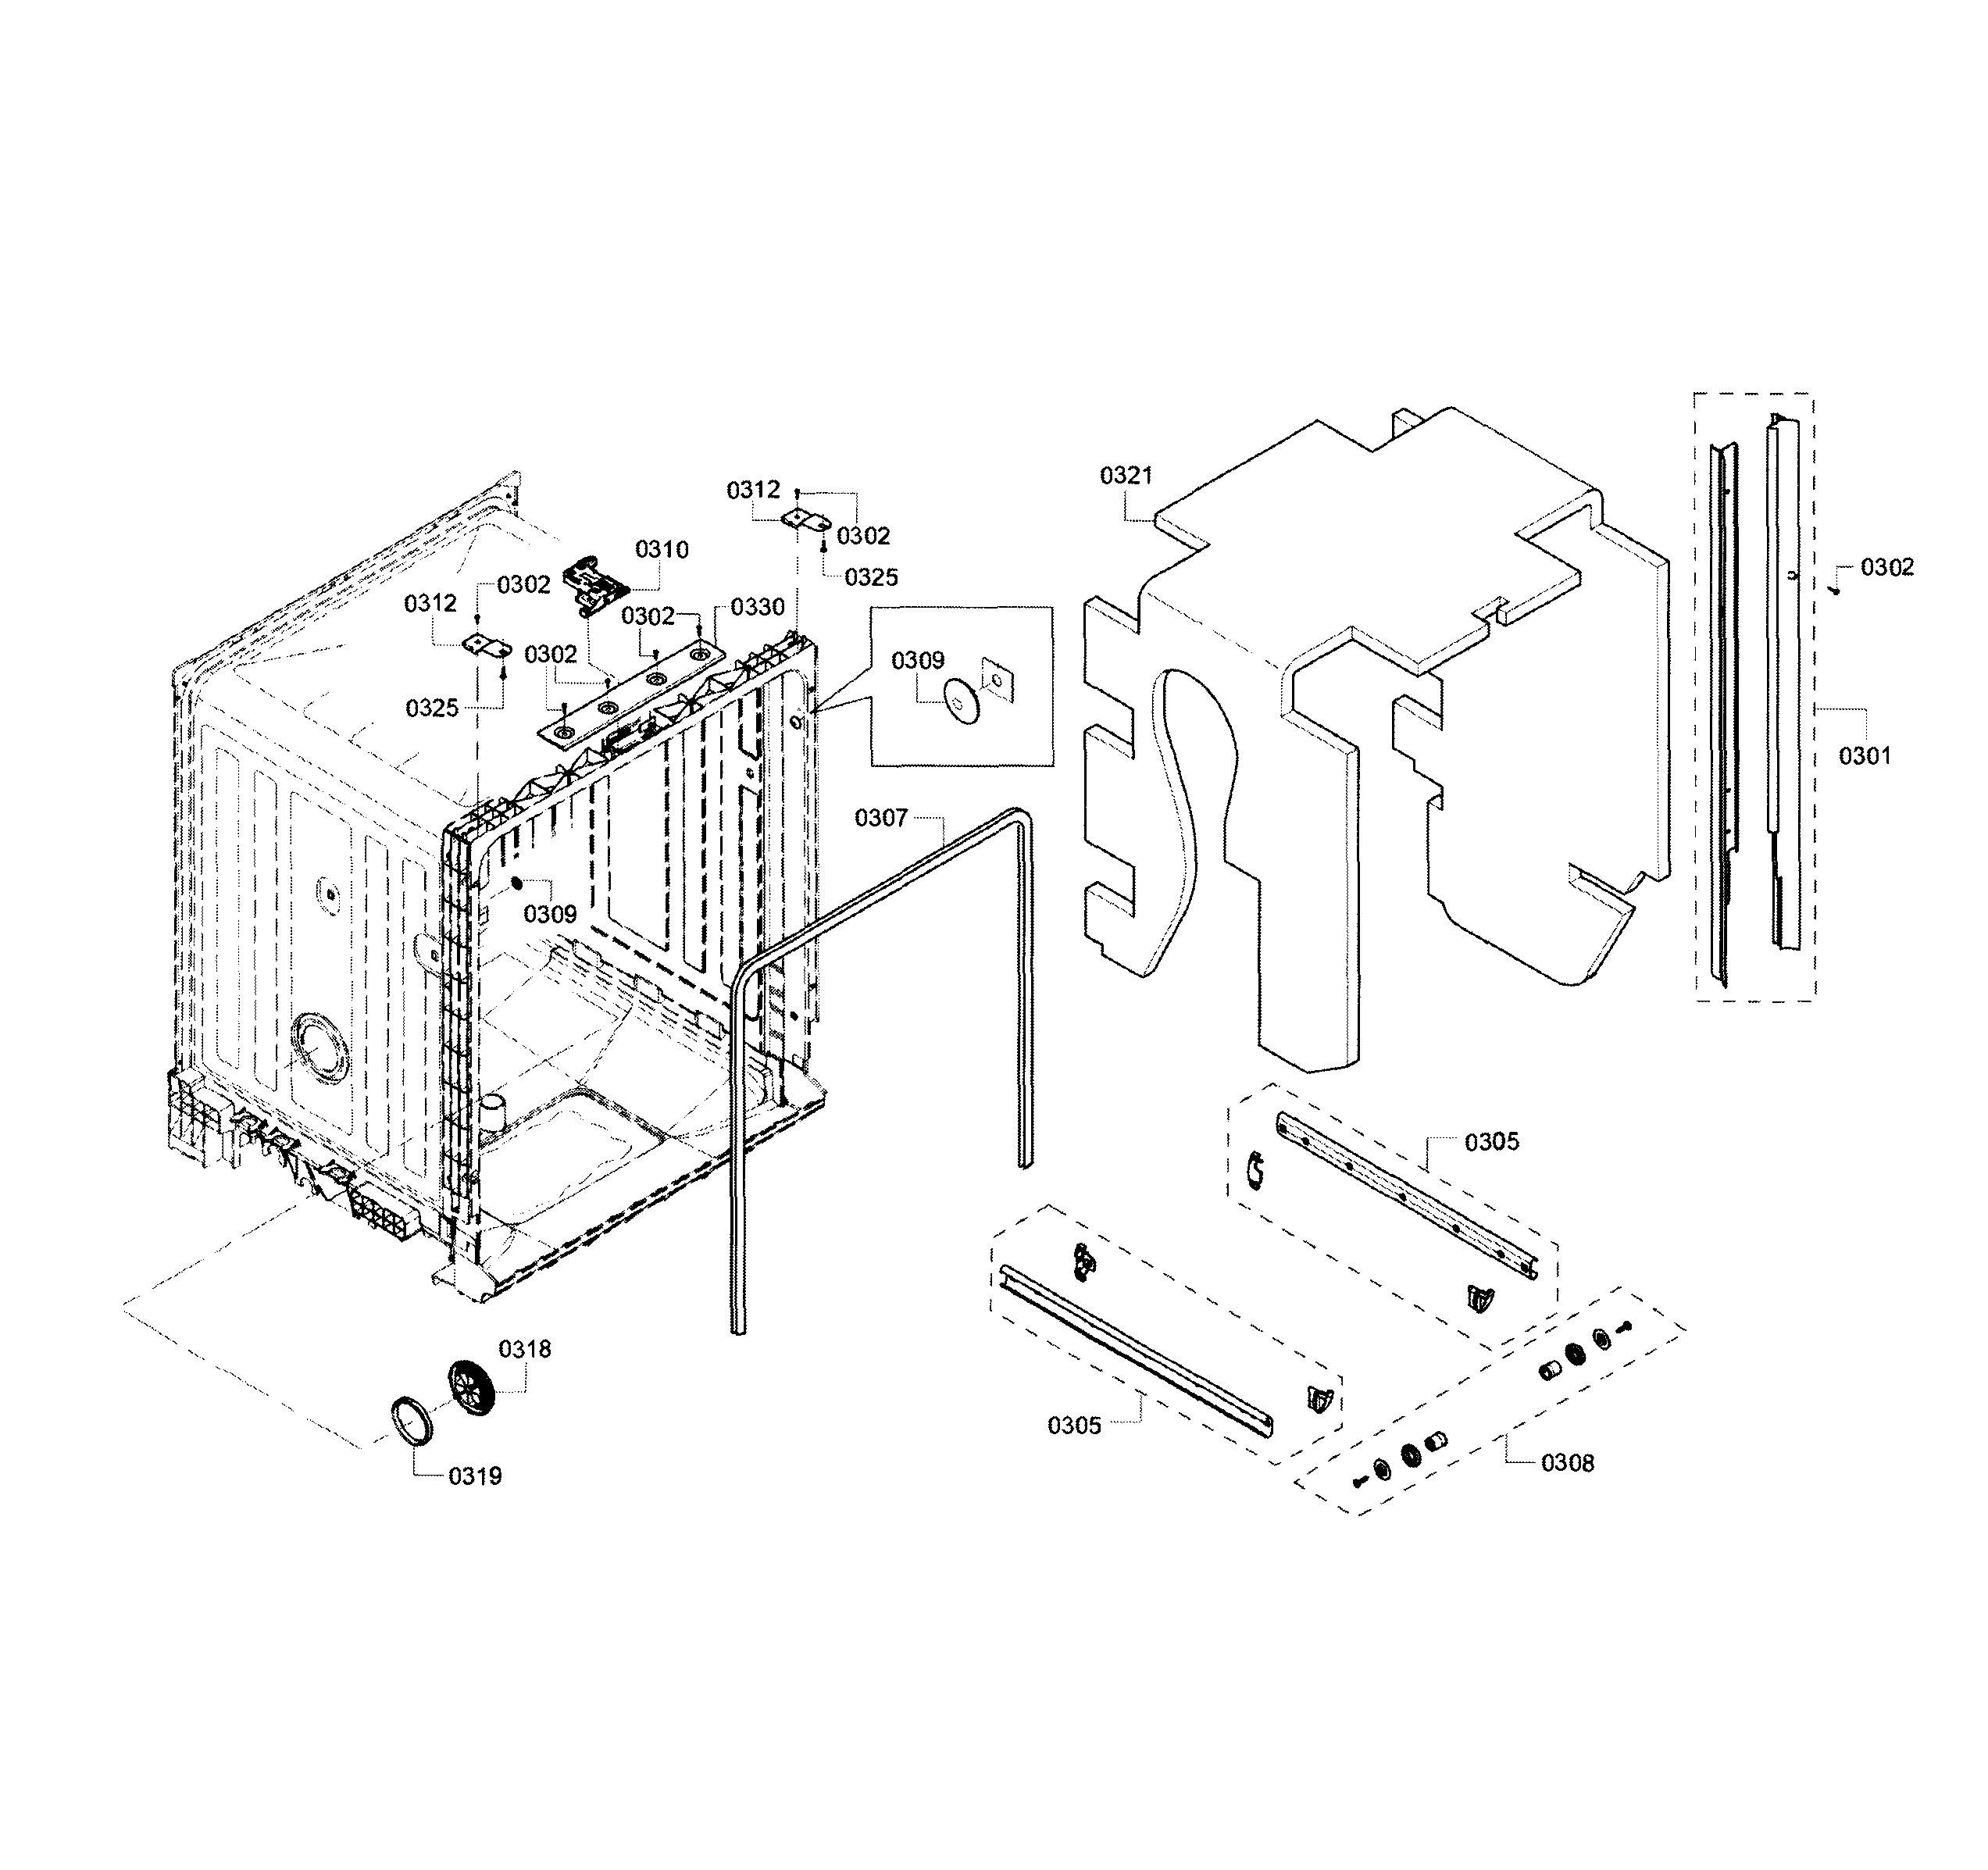 Bosch Dryer Parts Diagram Bosch Model She3ar55uc 11 Dishwasher Genuine Parts Of Bosch Dryer Parts Diagram